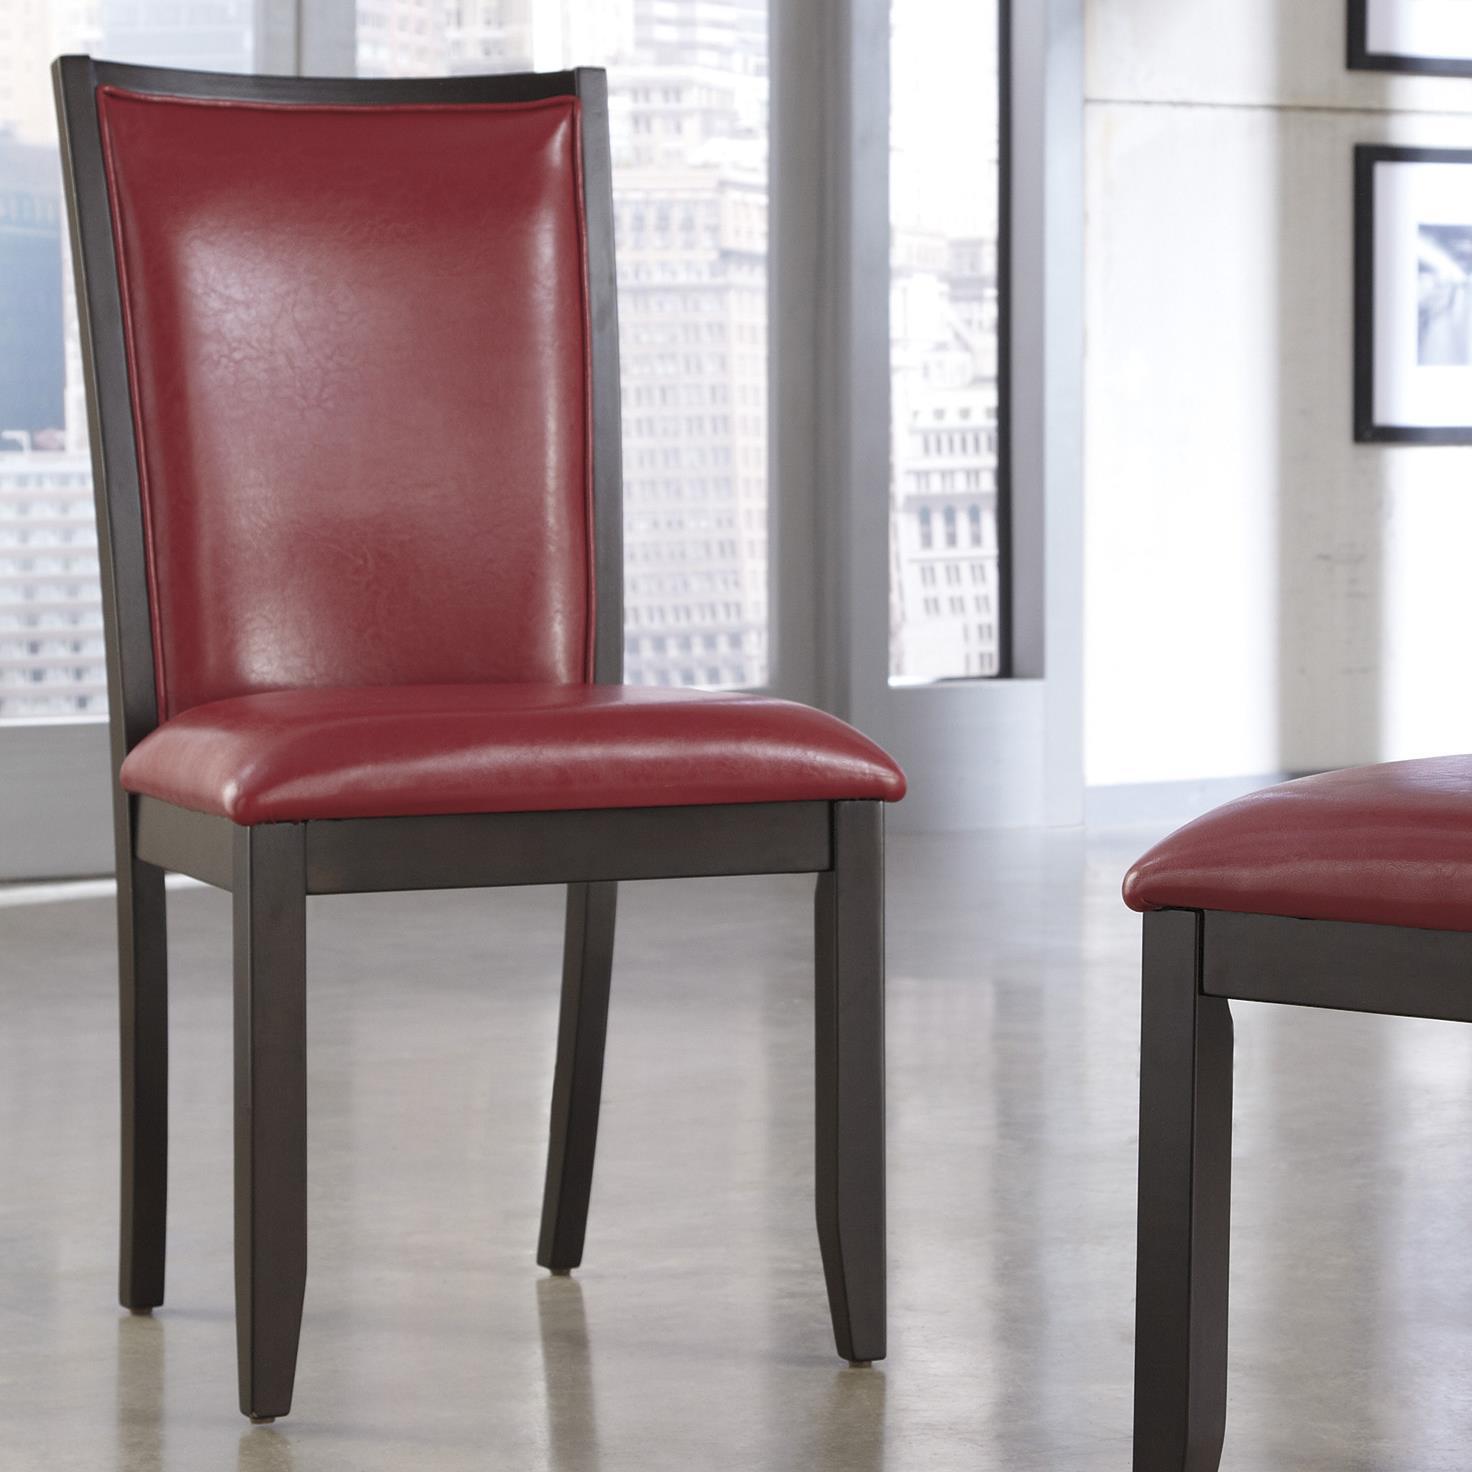 Ashley Furniture Trishelle Dining Upholstered Side Chair - Item Number: D550-04